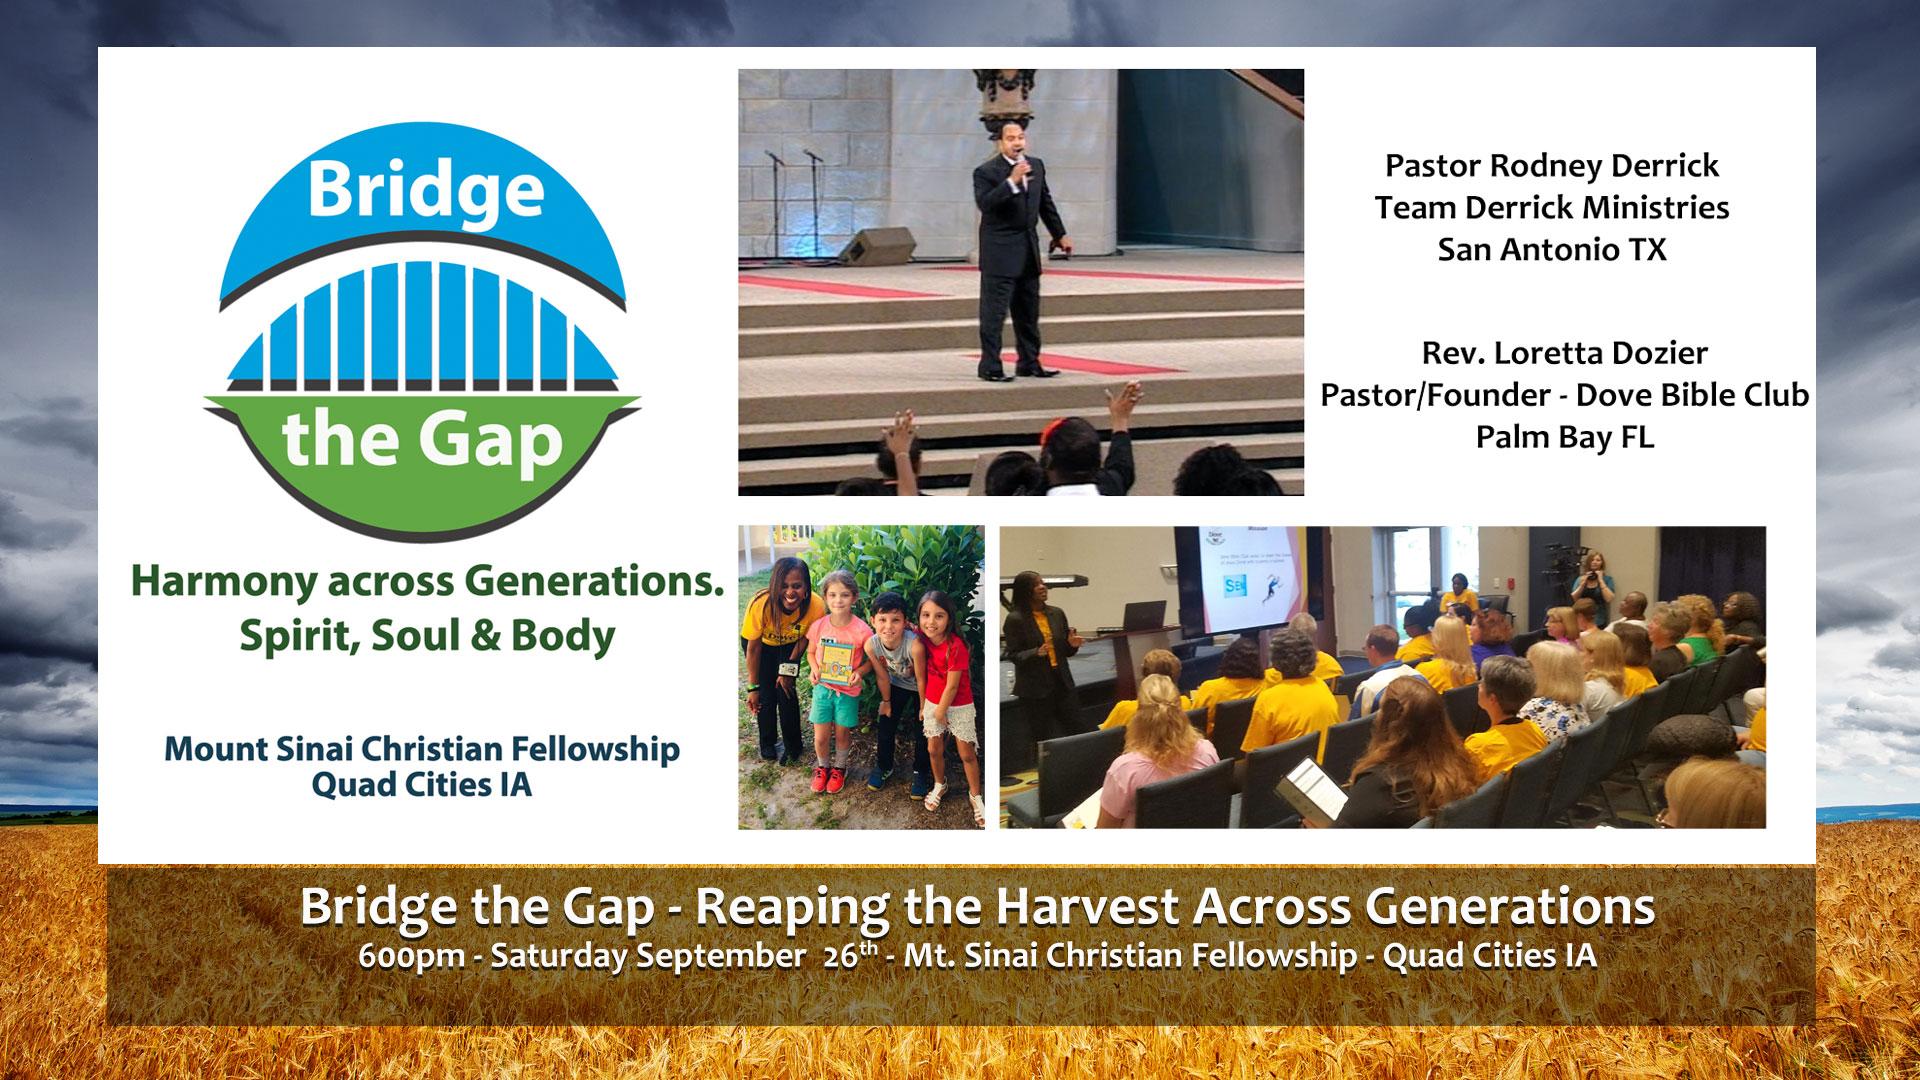 Bridge the Gap Conference